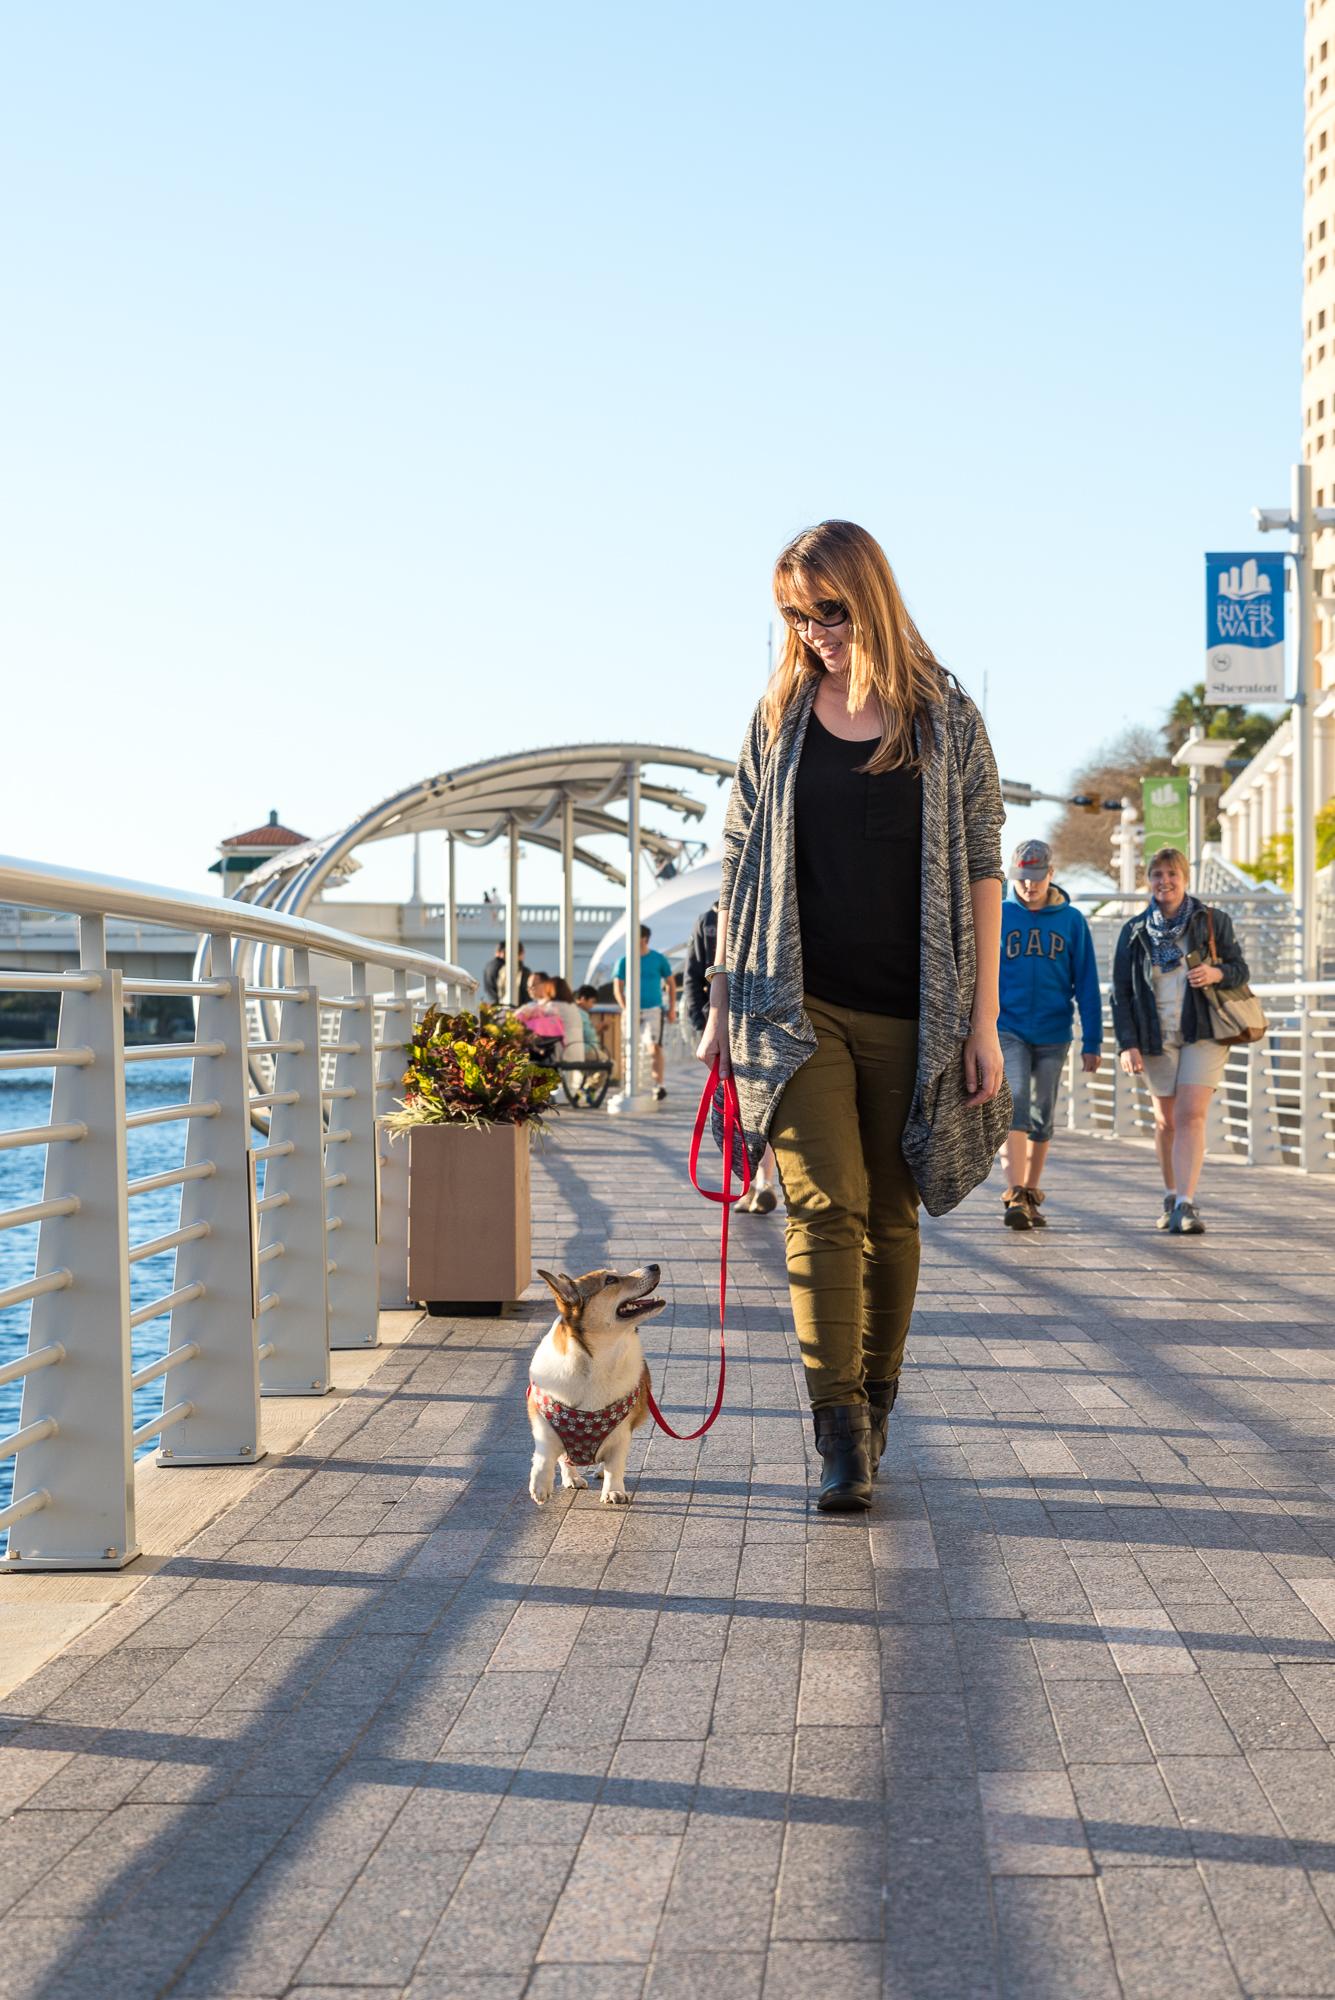 Taking a walk on the riverwalk